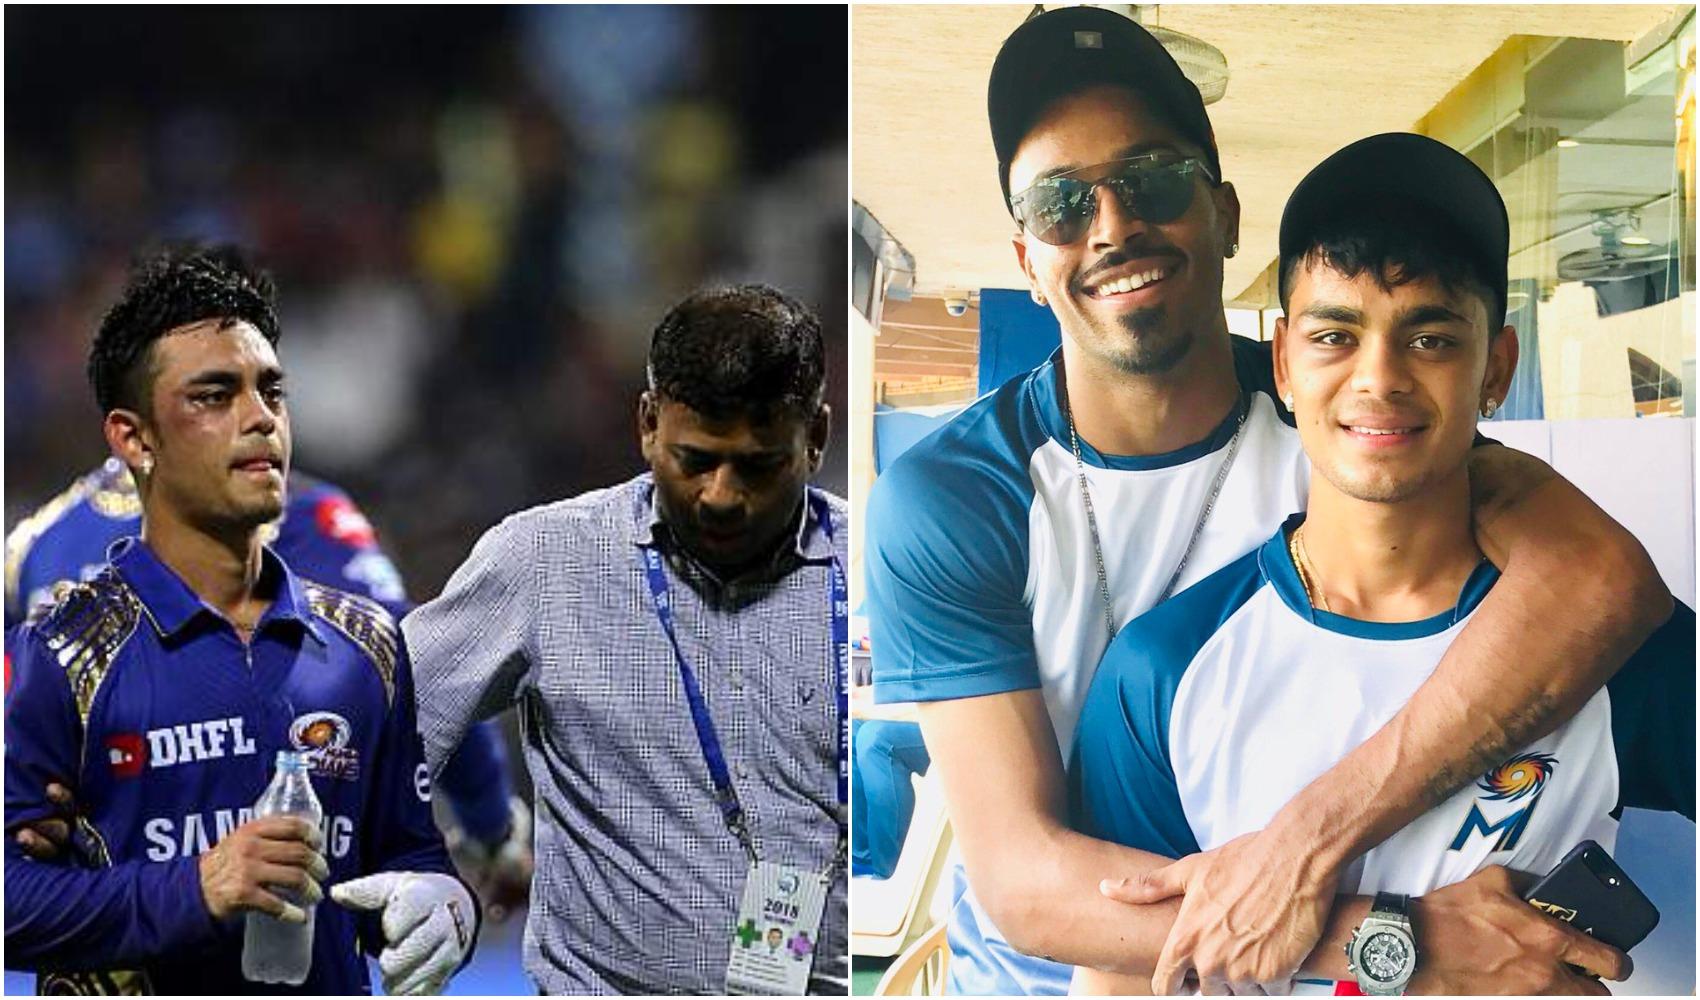 IPL 2018: हार्दिक पांड्या के थ्रो पर ईशान किशन को लगी थी आँख पर खतरनाक चोट तो अब हार्दिक ने काफी भावुक होकर मांगी ईशान से माफी 14